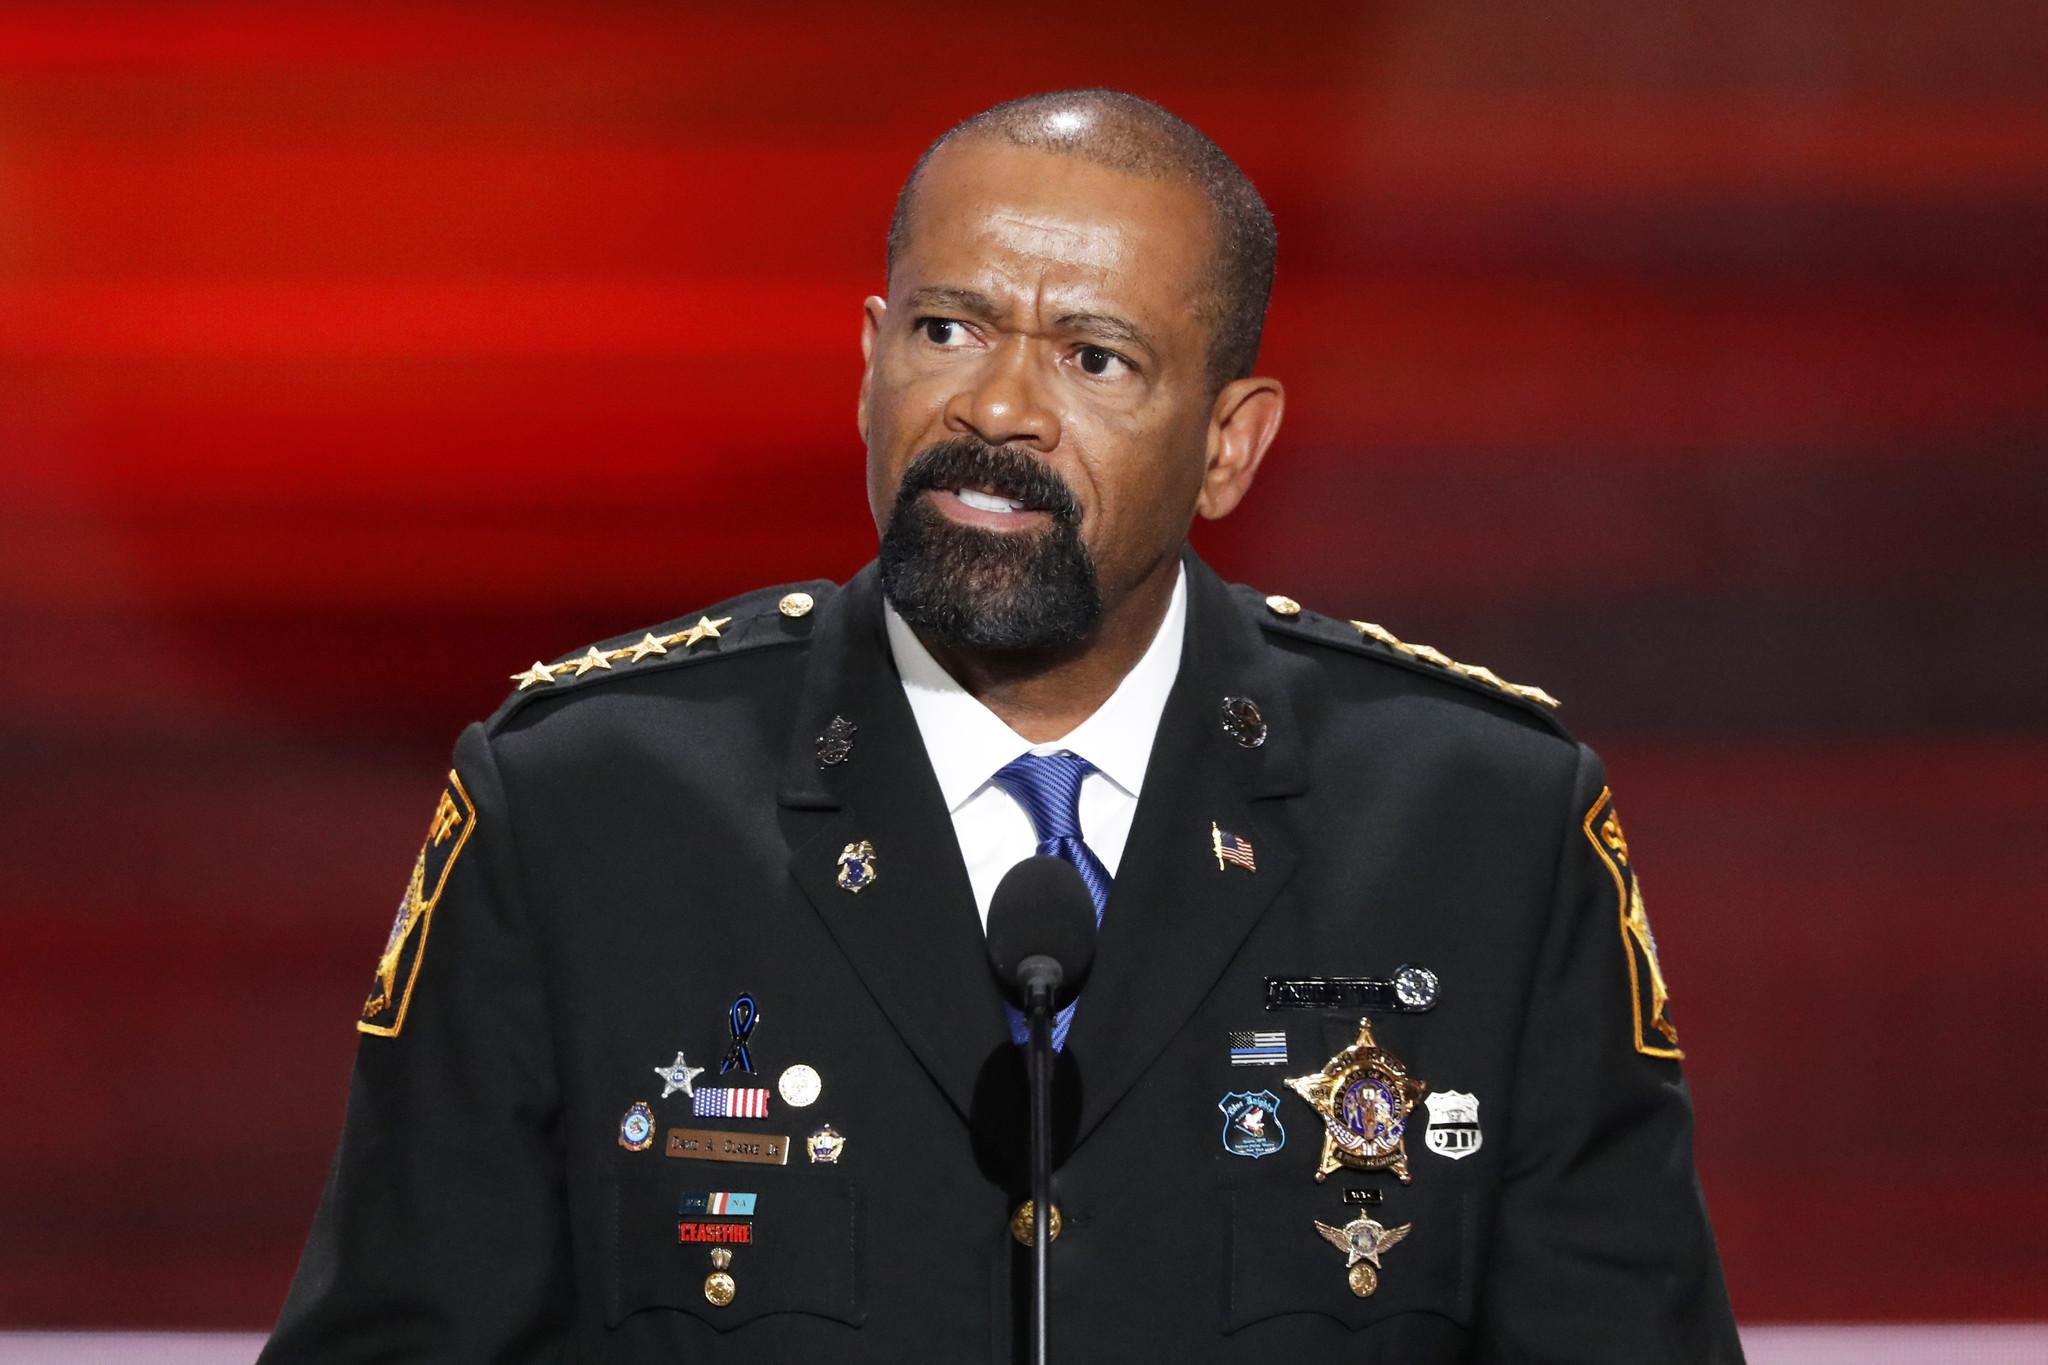 Wisconsin Gov. Walker: Won't remove Sheriff David Clarke over jail dehydration death